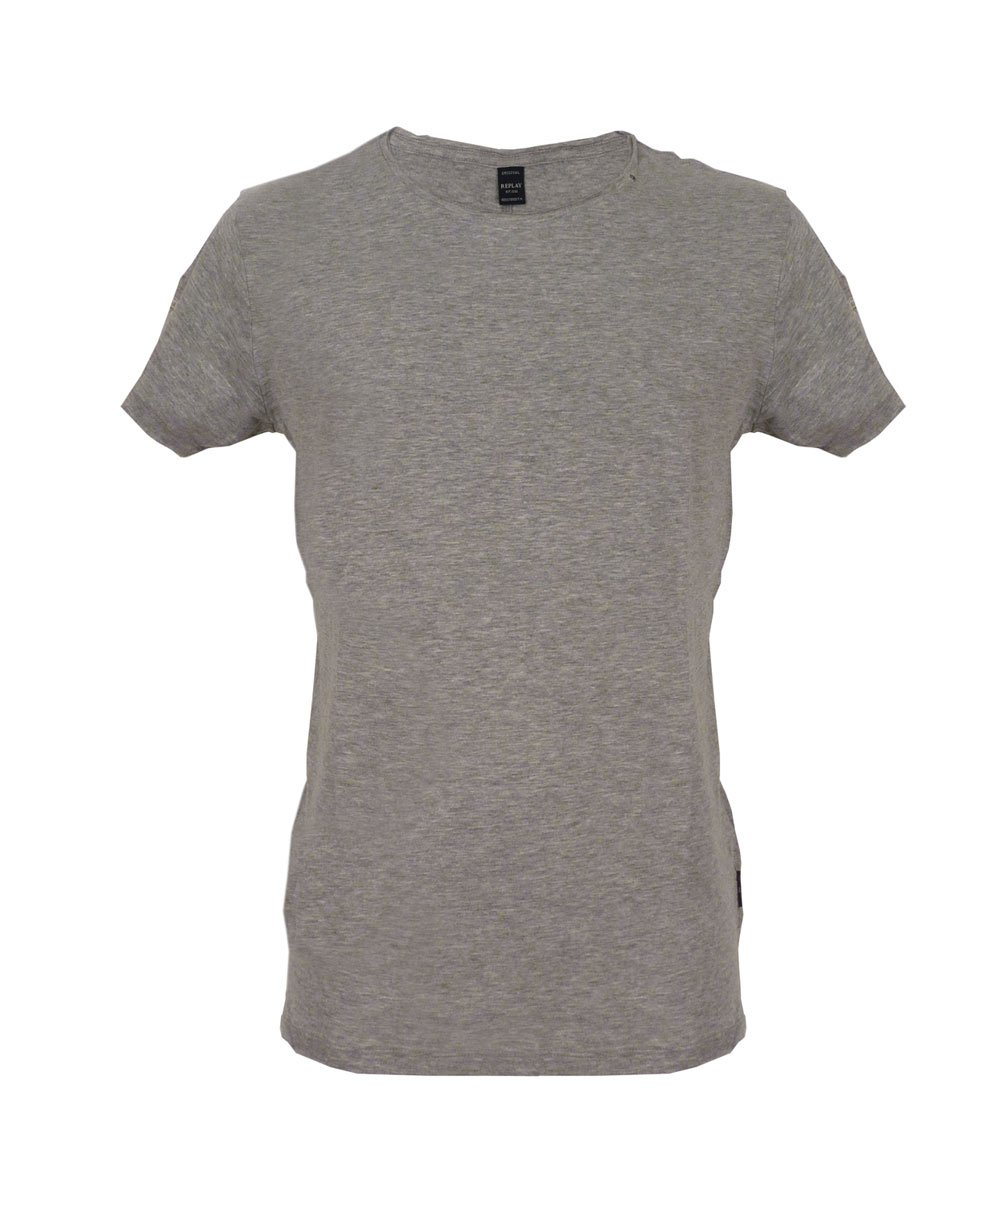 Marl grey m6882 t shirt for Grey marl t shirt